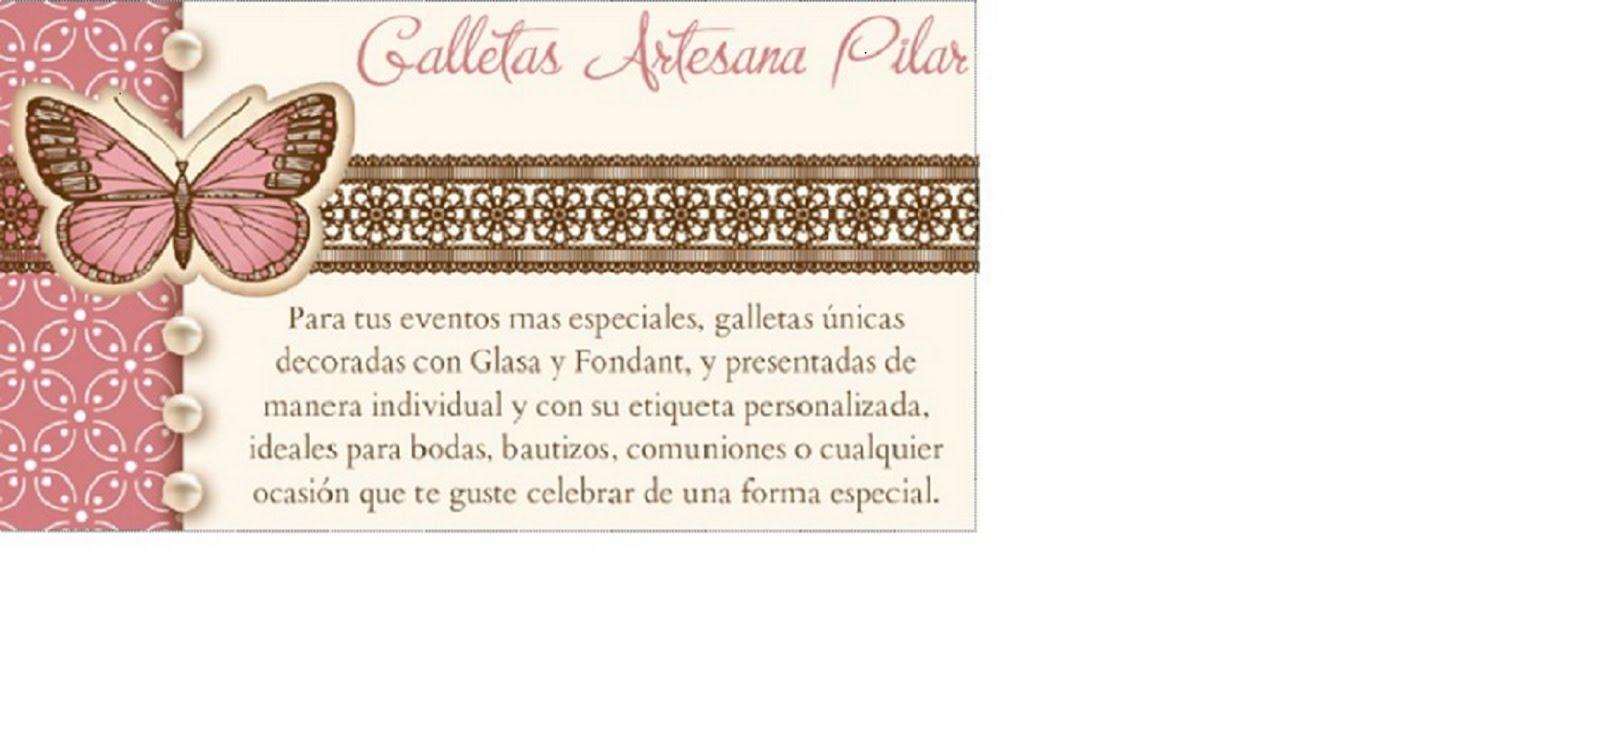 Galletas Artesanas Pilar